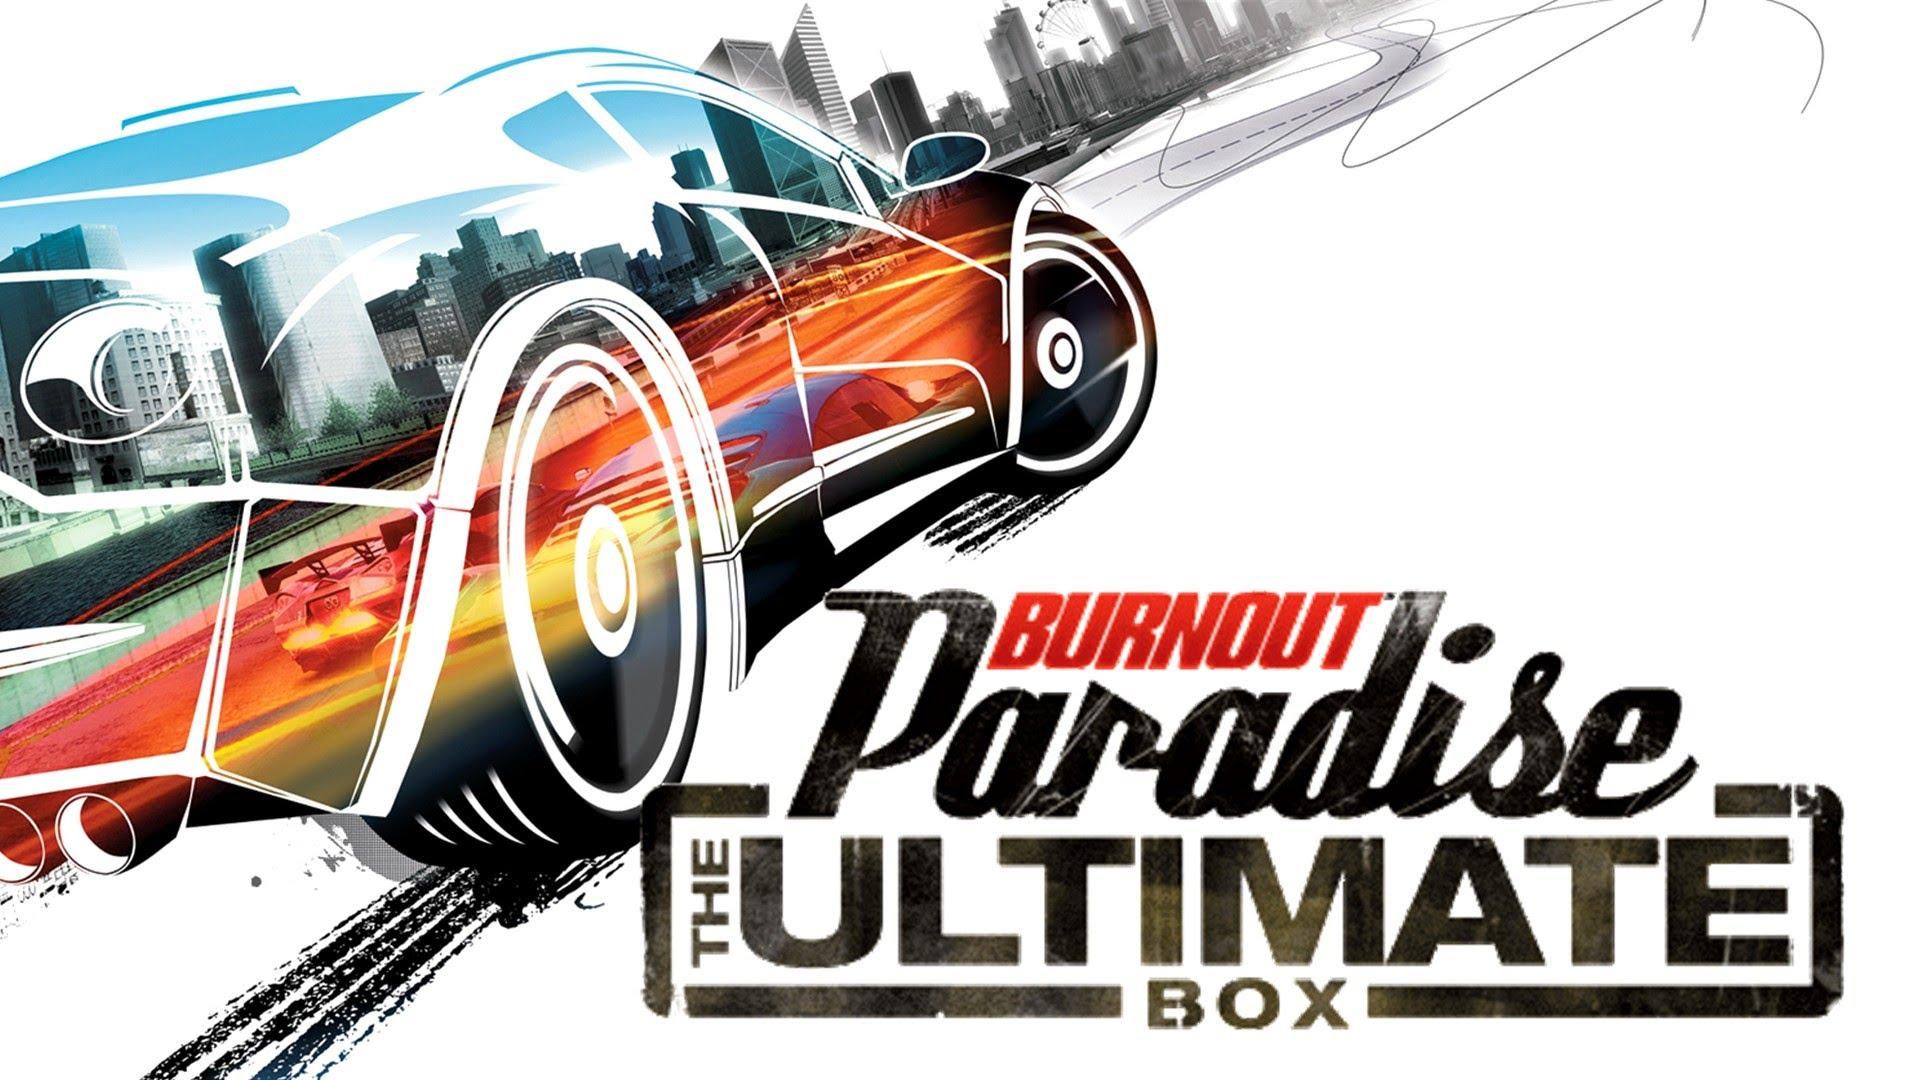 Burnout Paradise Ultimate Box